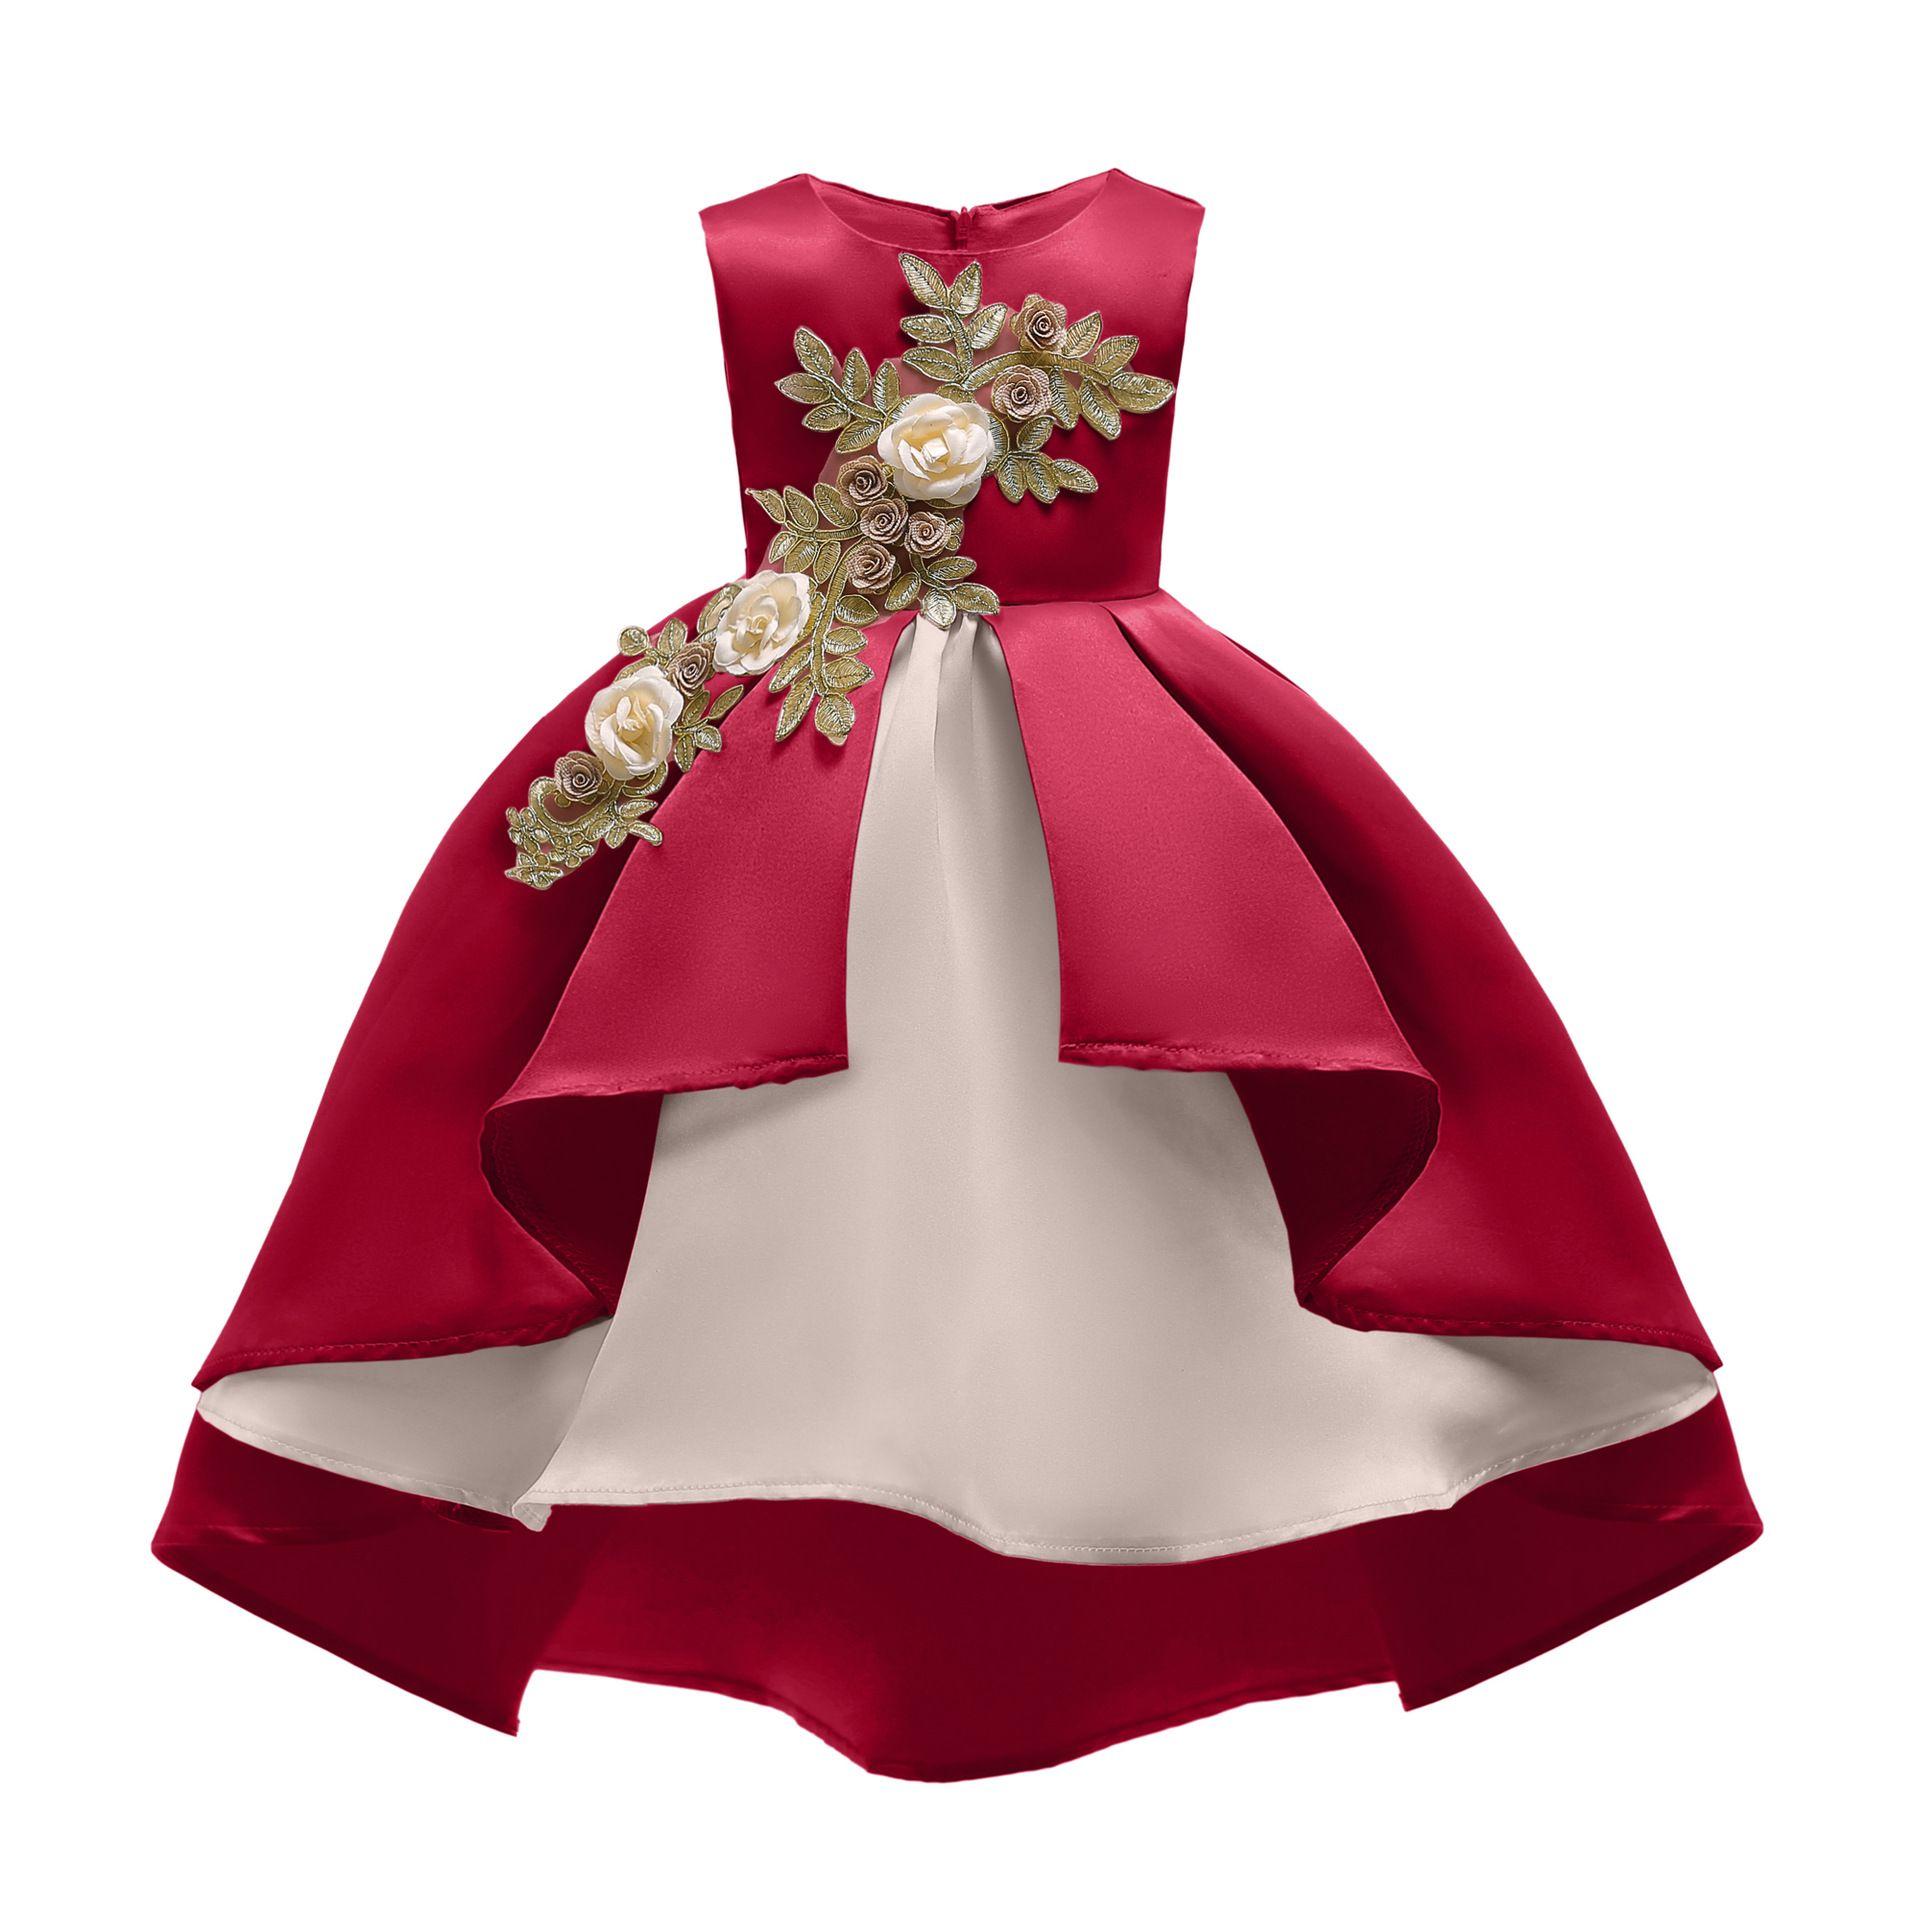 Retail Baby Girls wedding dress 2019 Kids Irregular Embroidered Prom Dress Red Champagne Children Girls Satin Full dress Boutique clothes